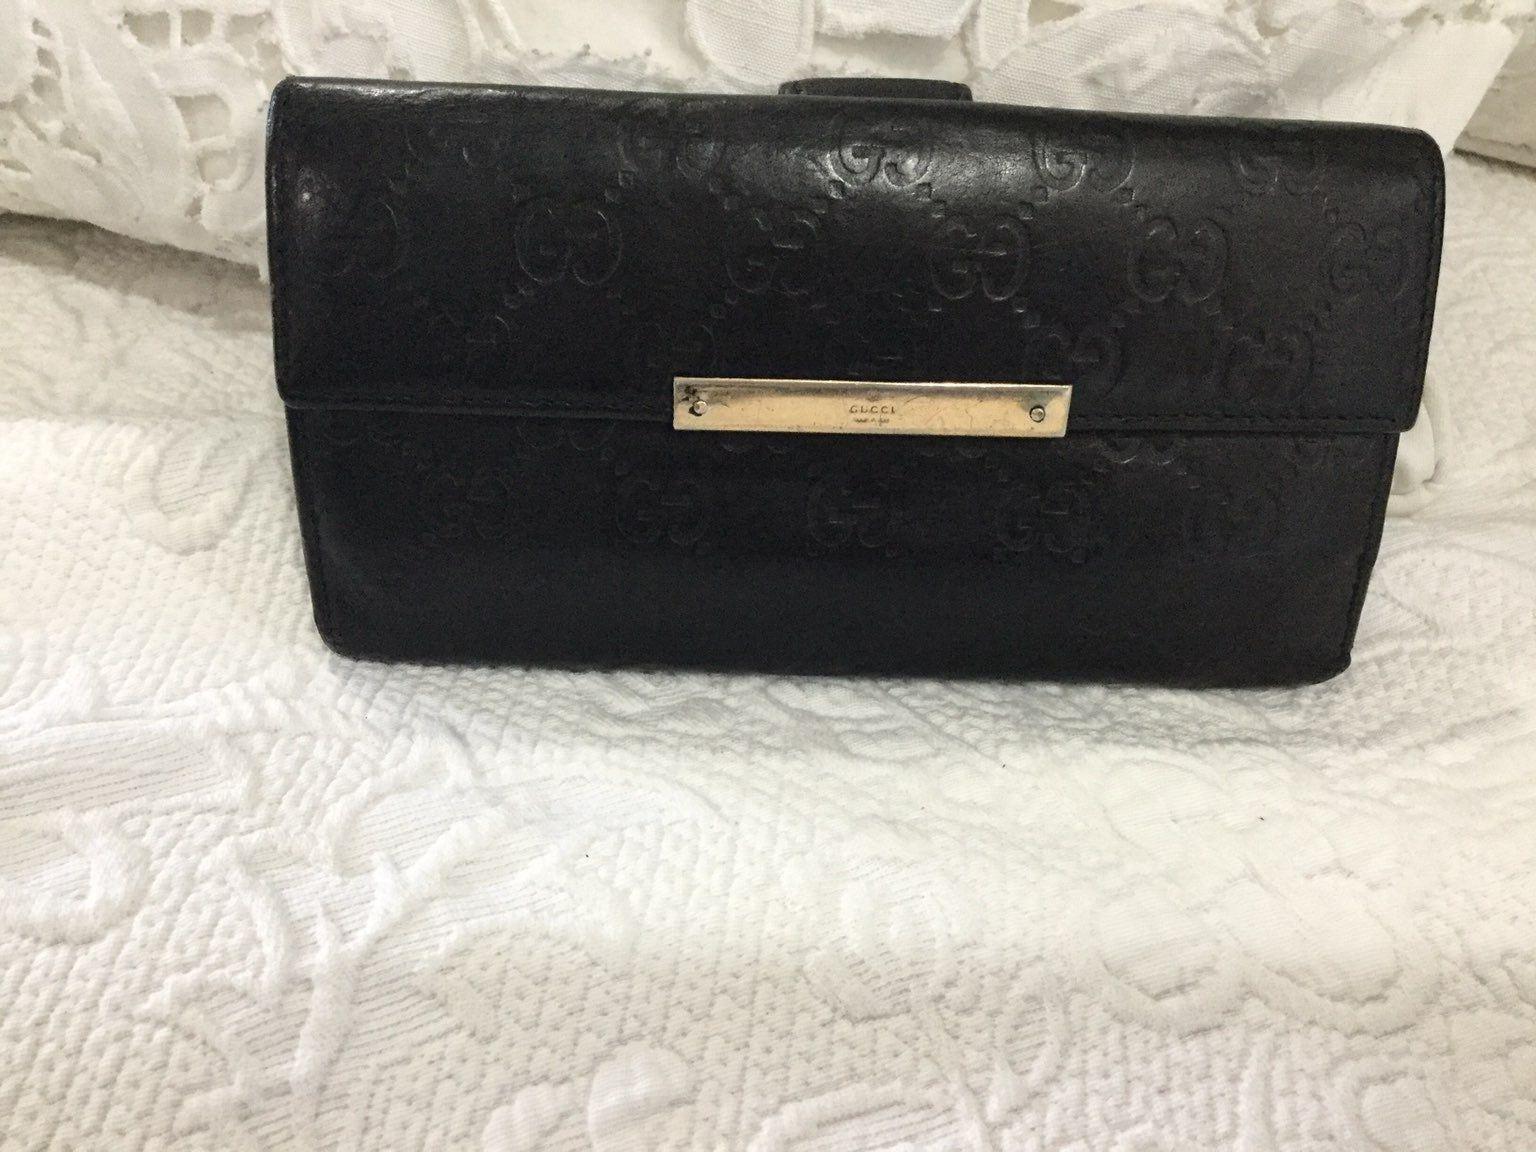 Gucci black wallet gg print gucci wallet wallet black